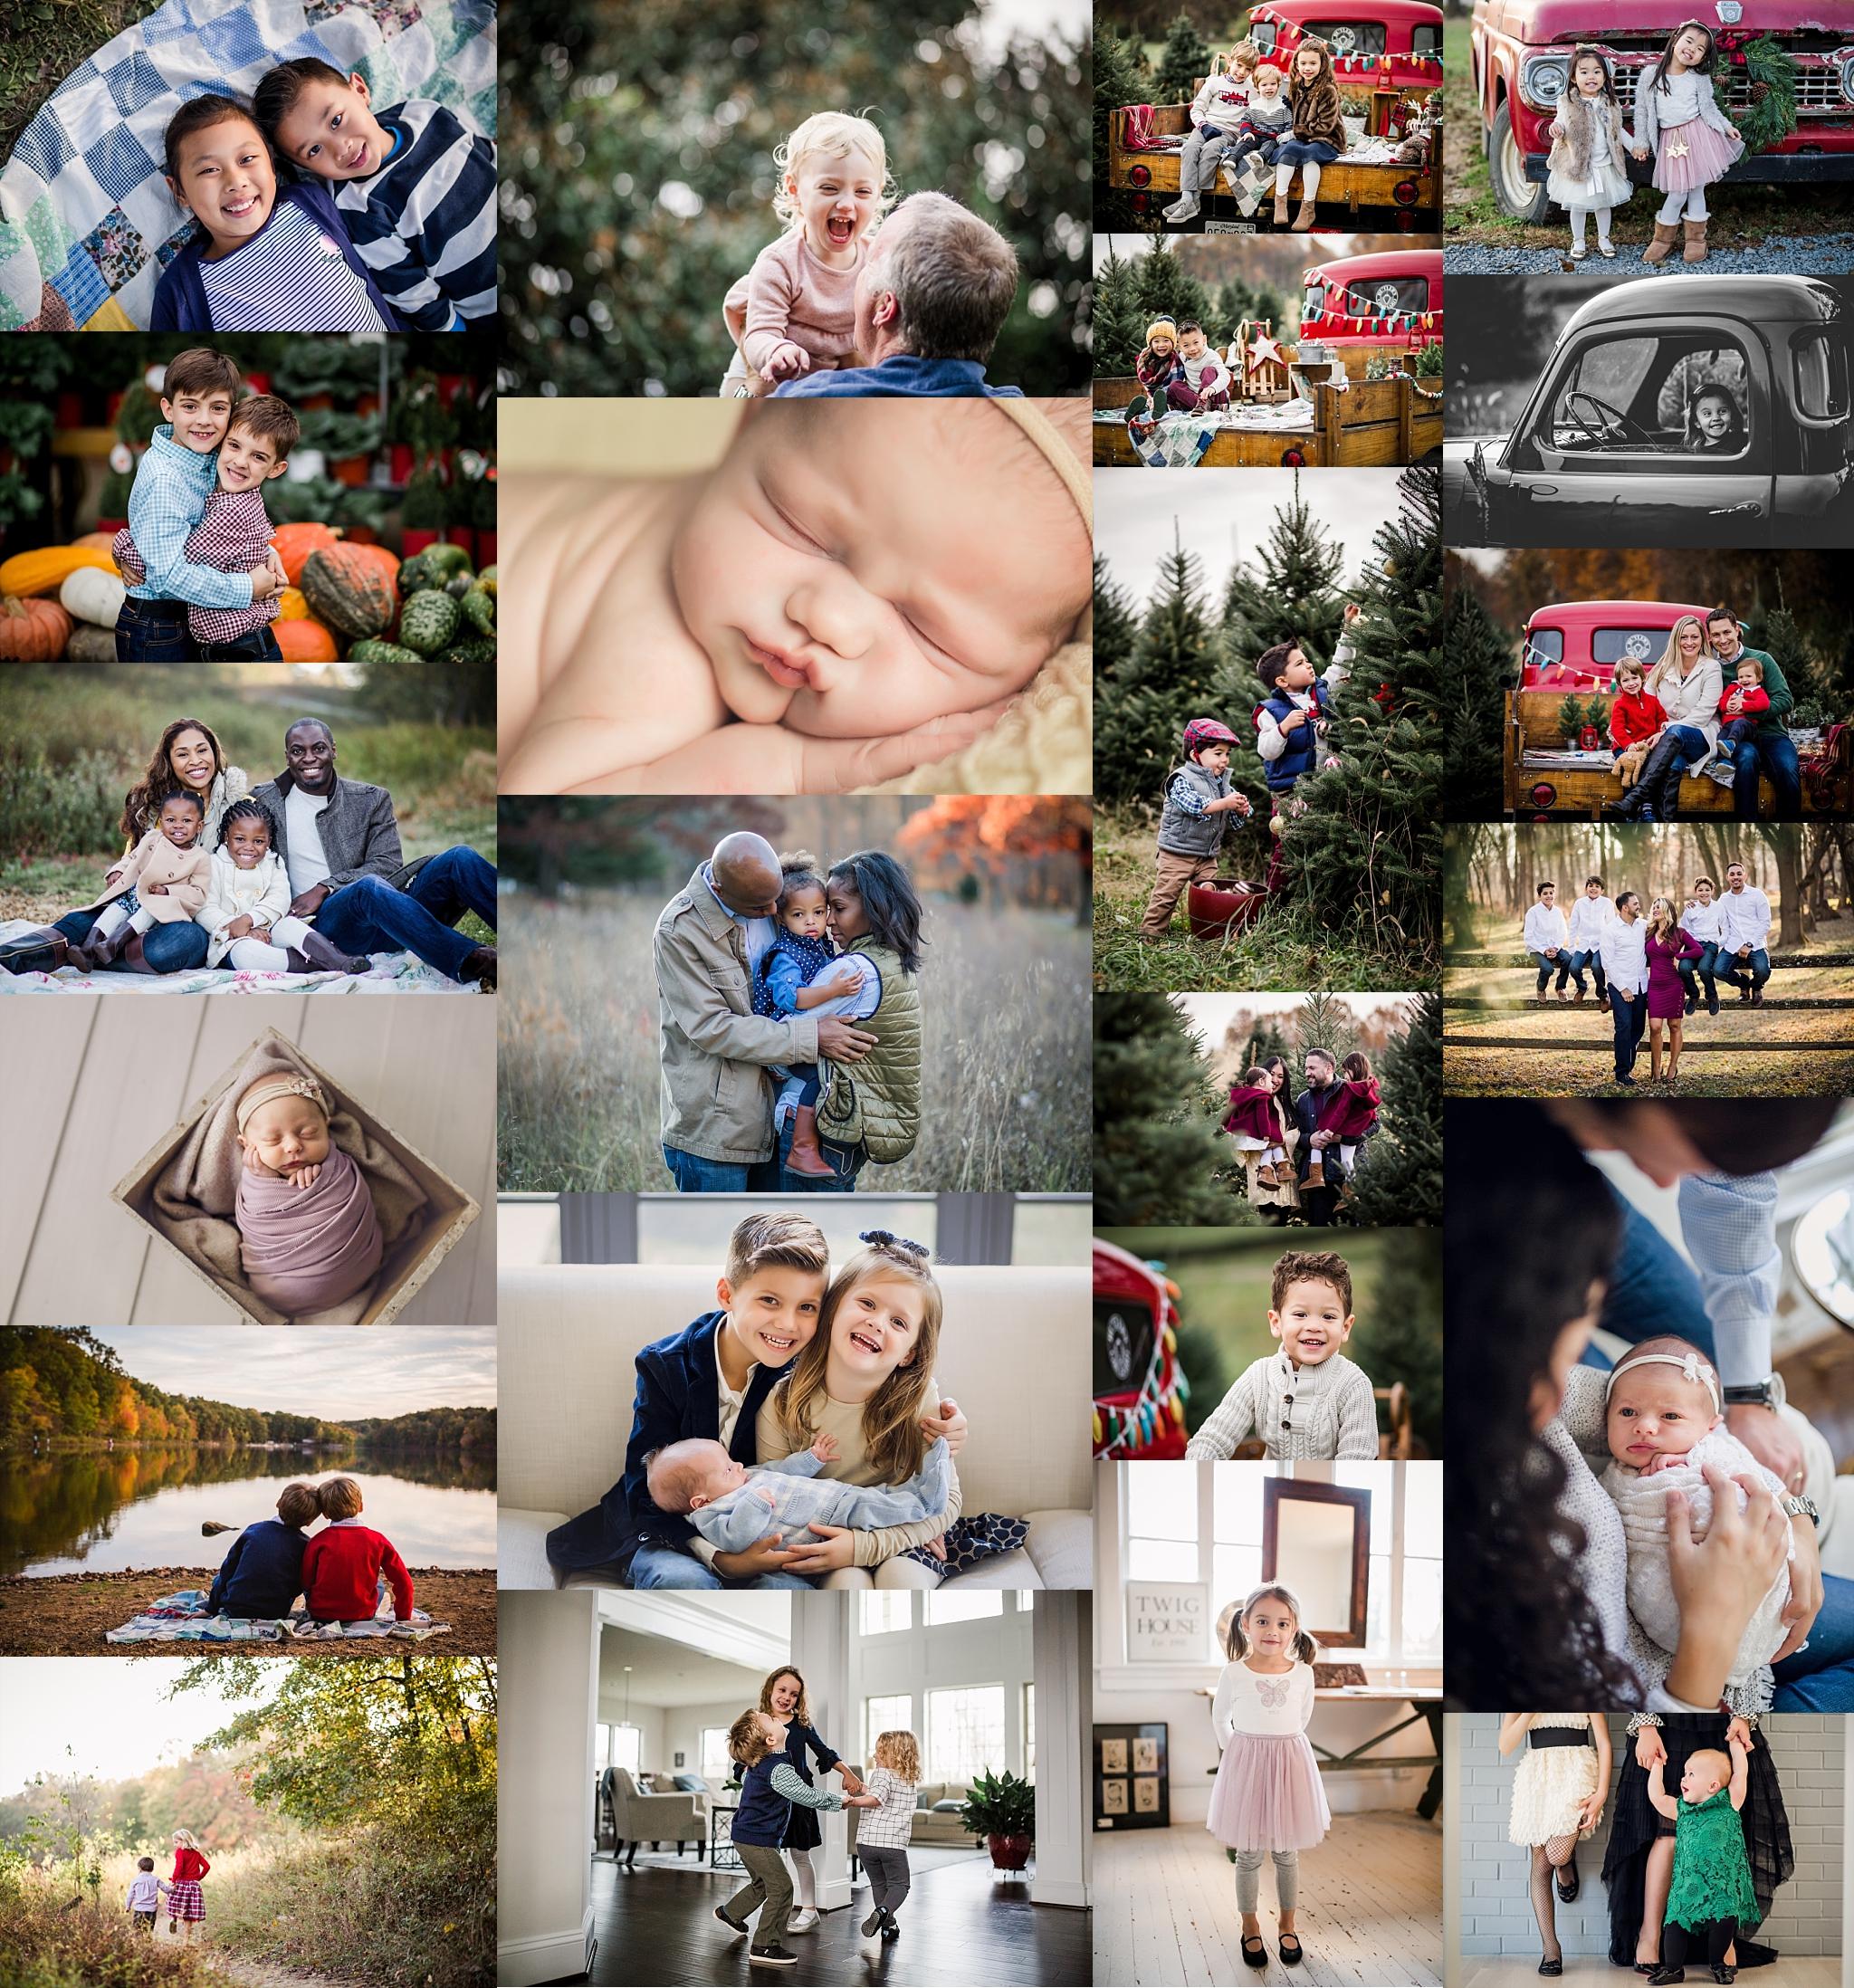 Newborn Baby and Family Photo Session | Tonya Teran Photography, DC, MD, VA Best Newborn, Baby, and Family Photographer